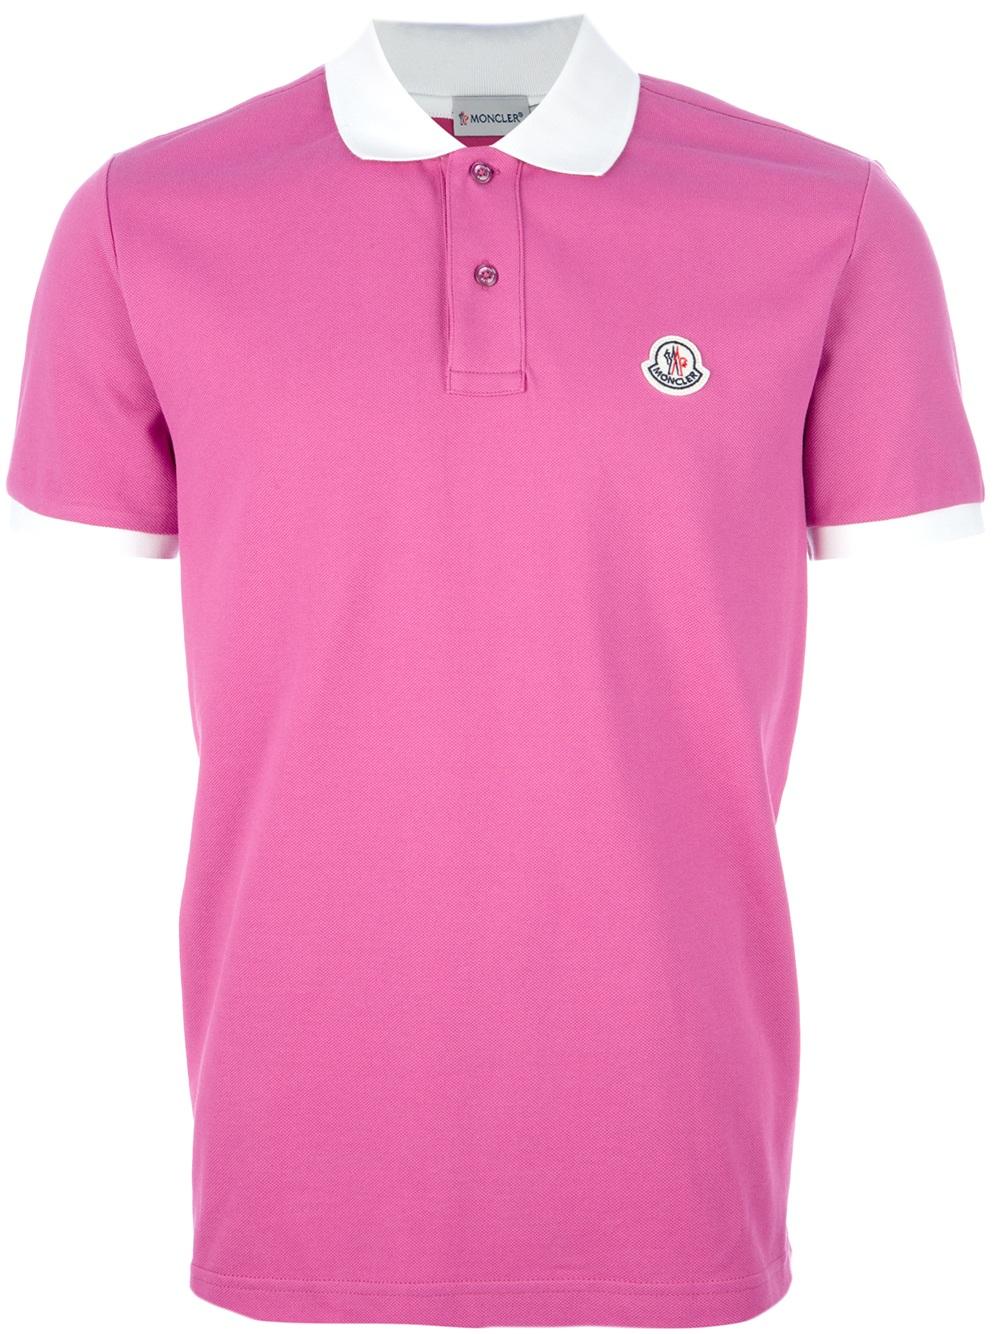 For In Polo Pink Lyst Men Moncler Shirt xQrthdsC